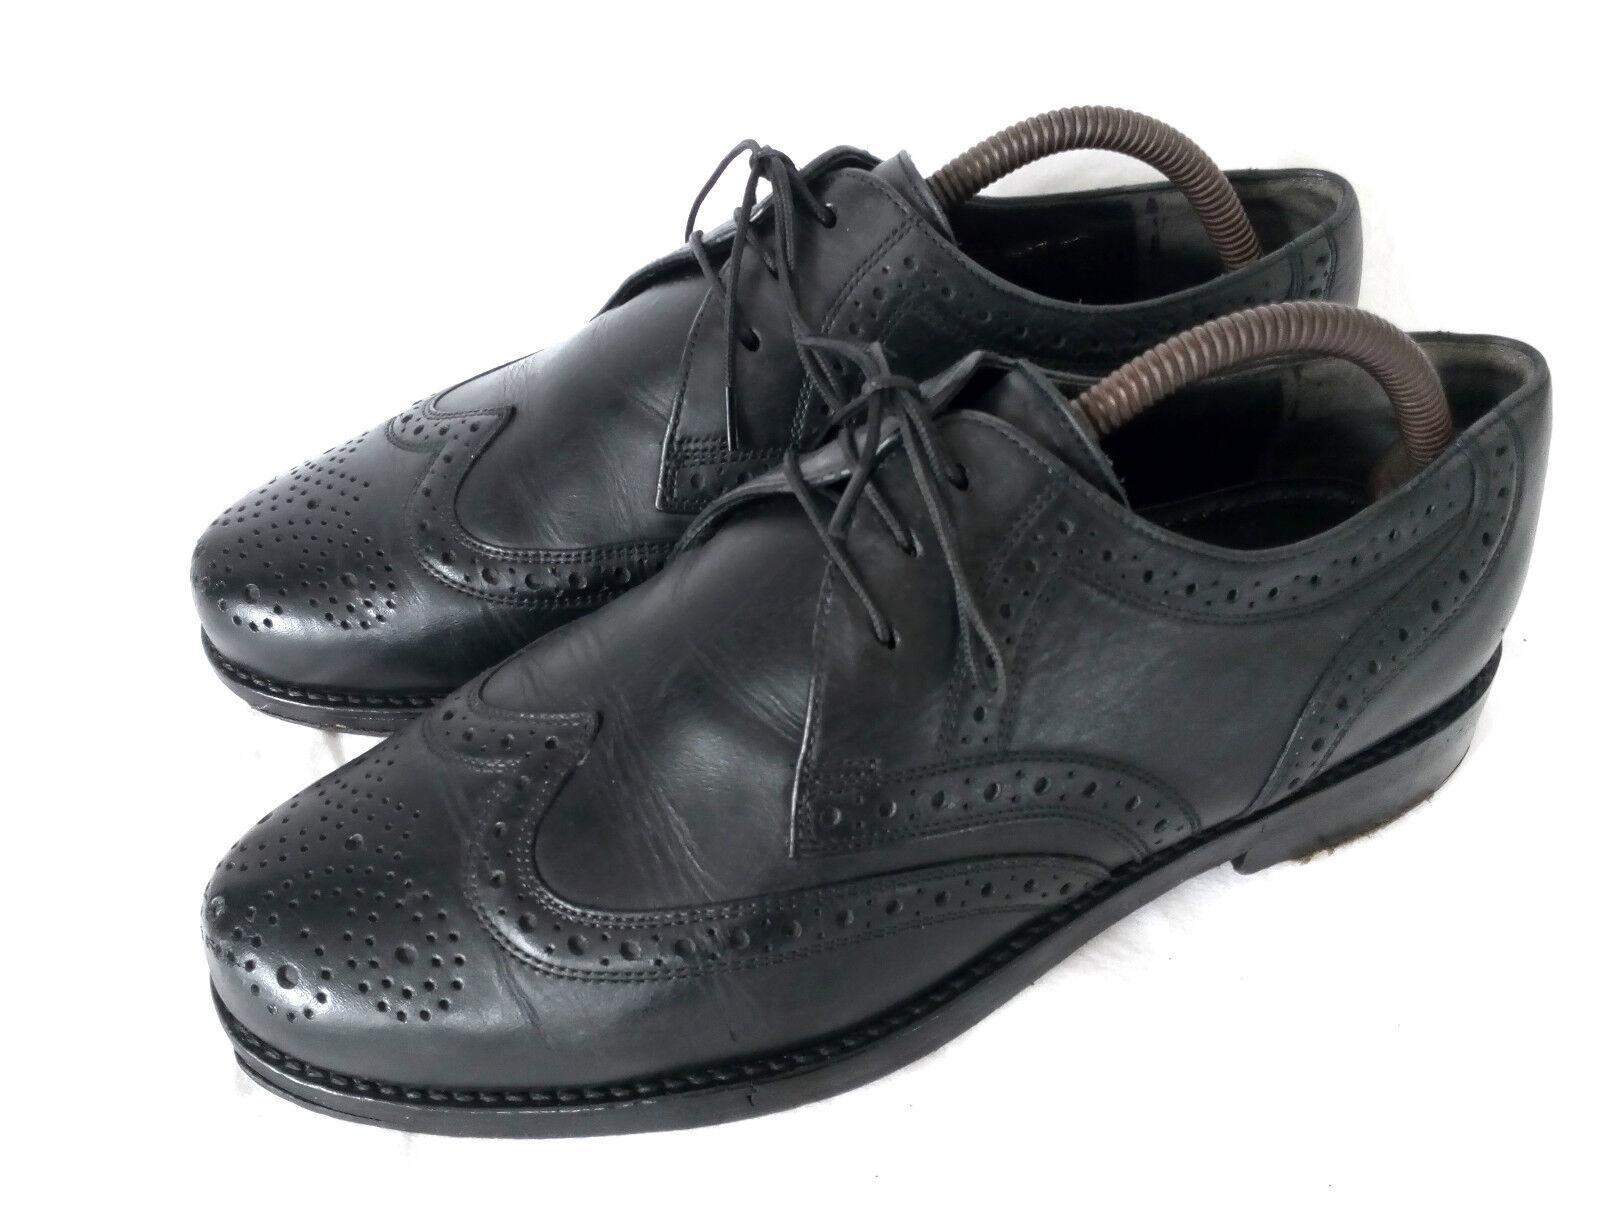 Apollo vintage Full brogue derby Affaires Chaussures Hommes Noir Cuir 6 39,5